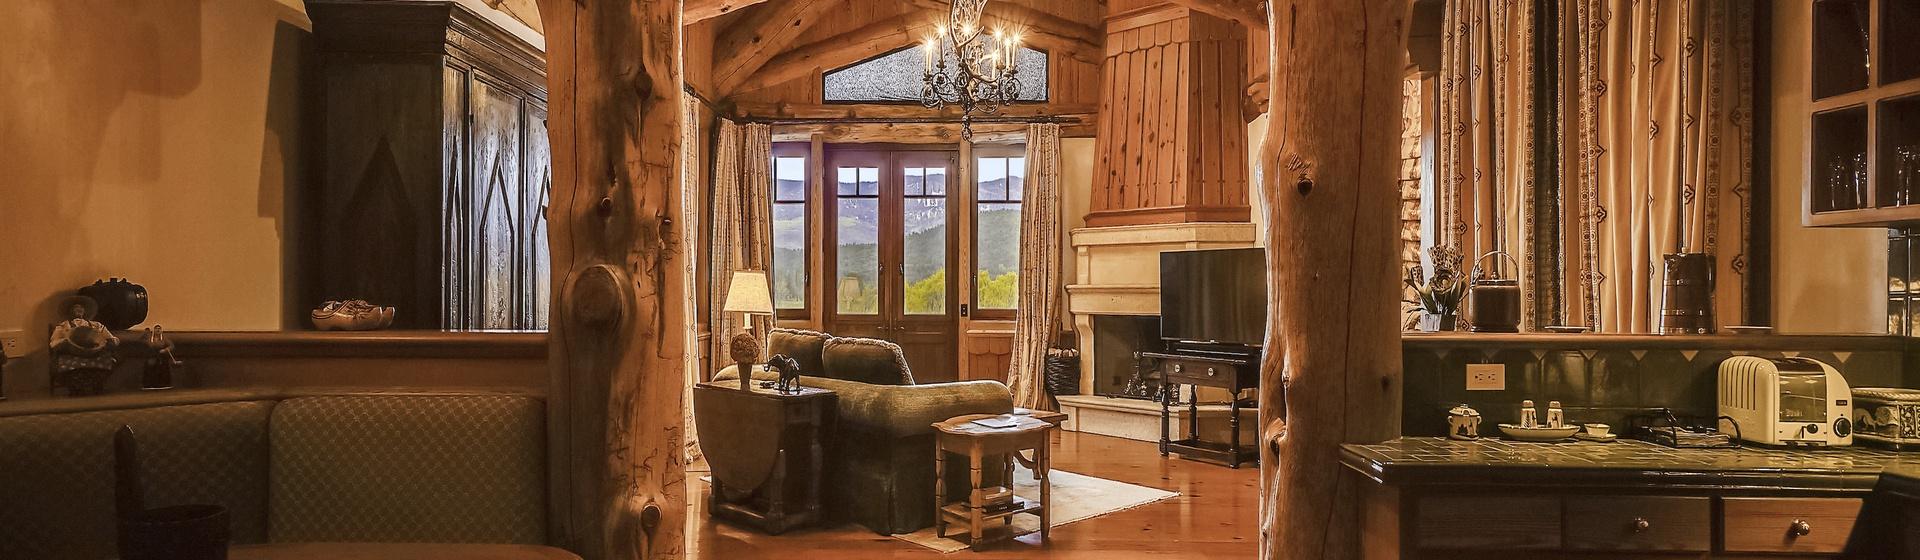 9.3-Telluride-Sleeping-Indian-Ranch-Swiss-Suite-Kitchen-Bar-web.JPG